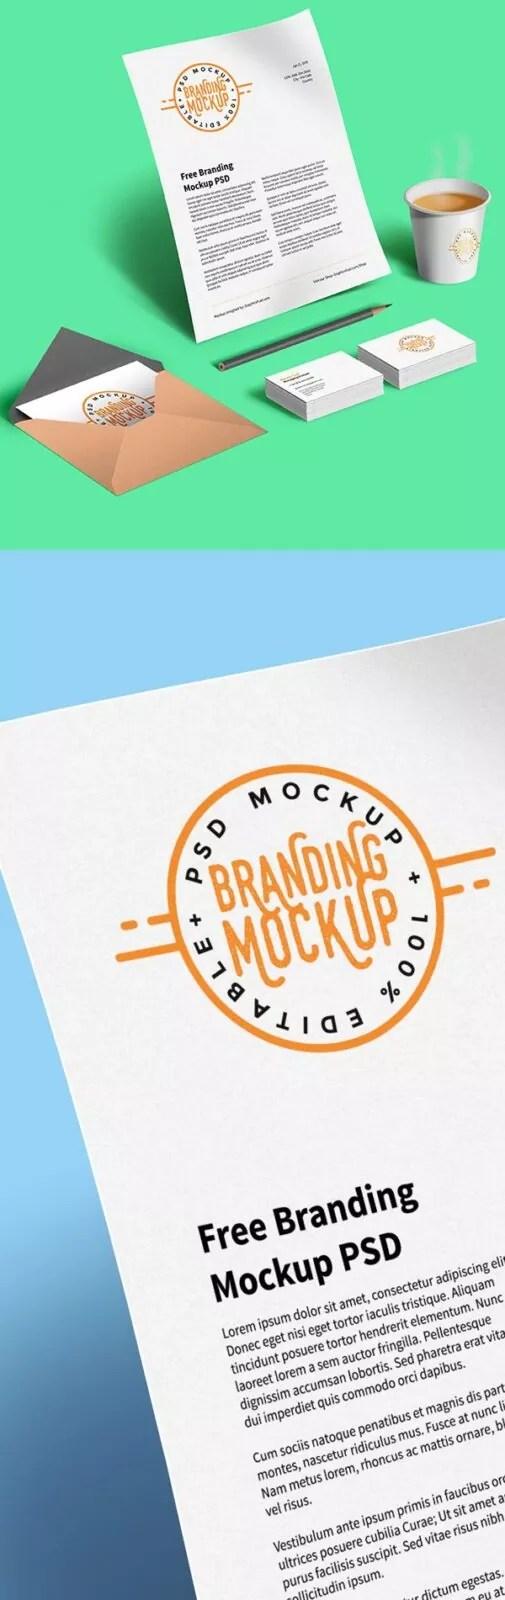 branding mockup psd design 323x1024 - 60+ Branding, Identity & Stationery Free PSD Mockups